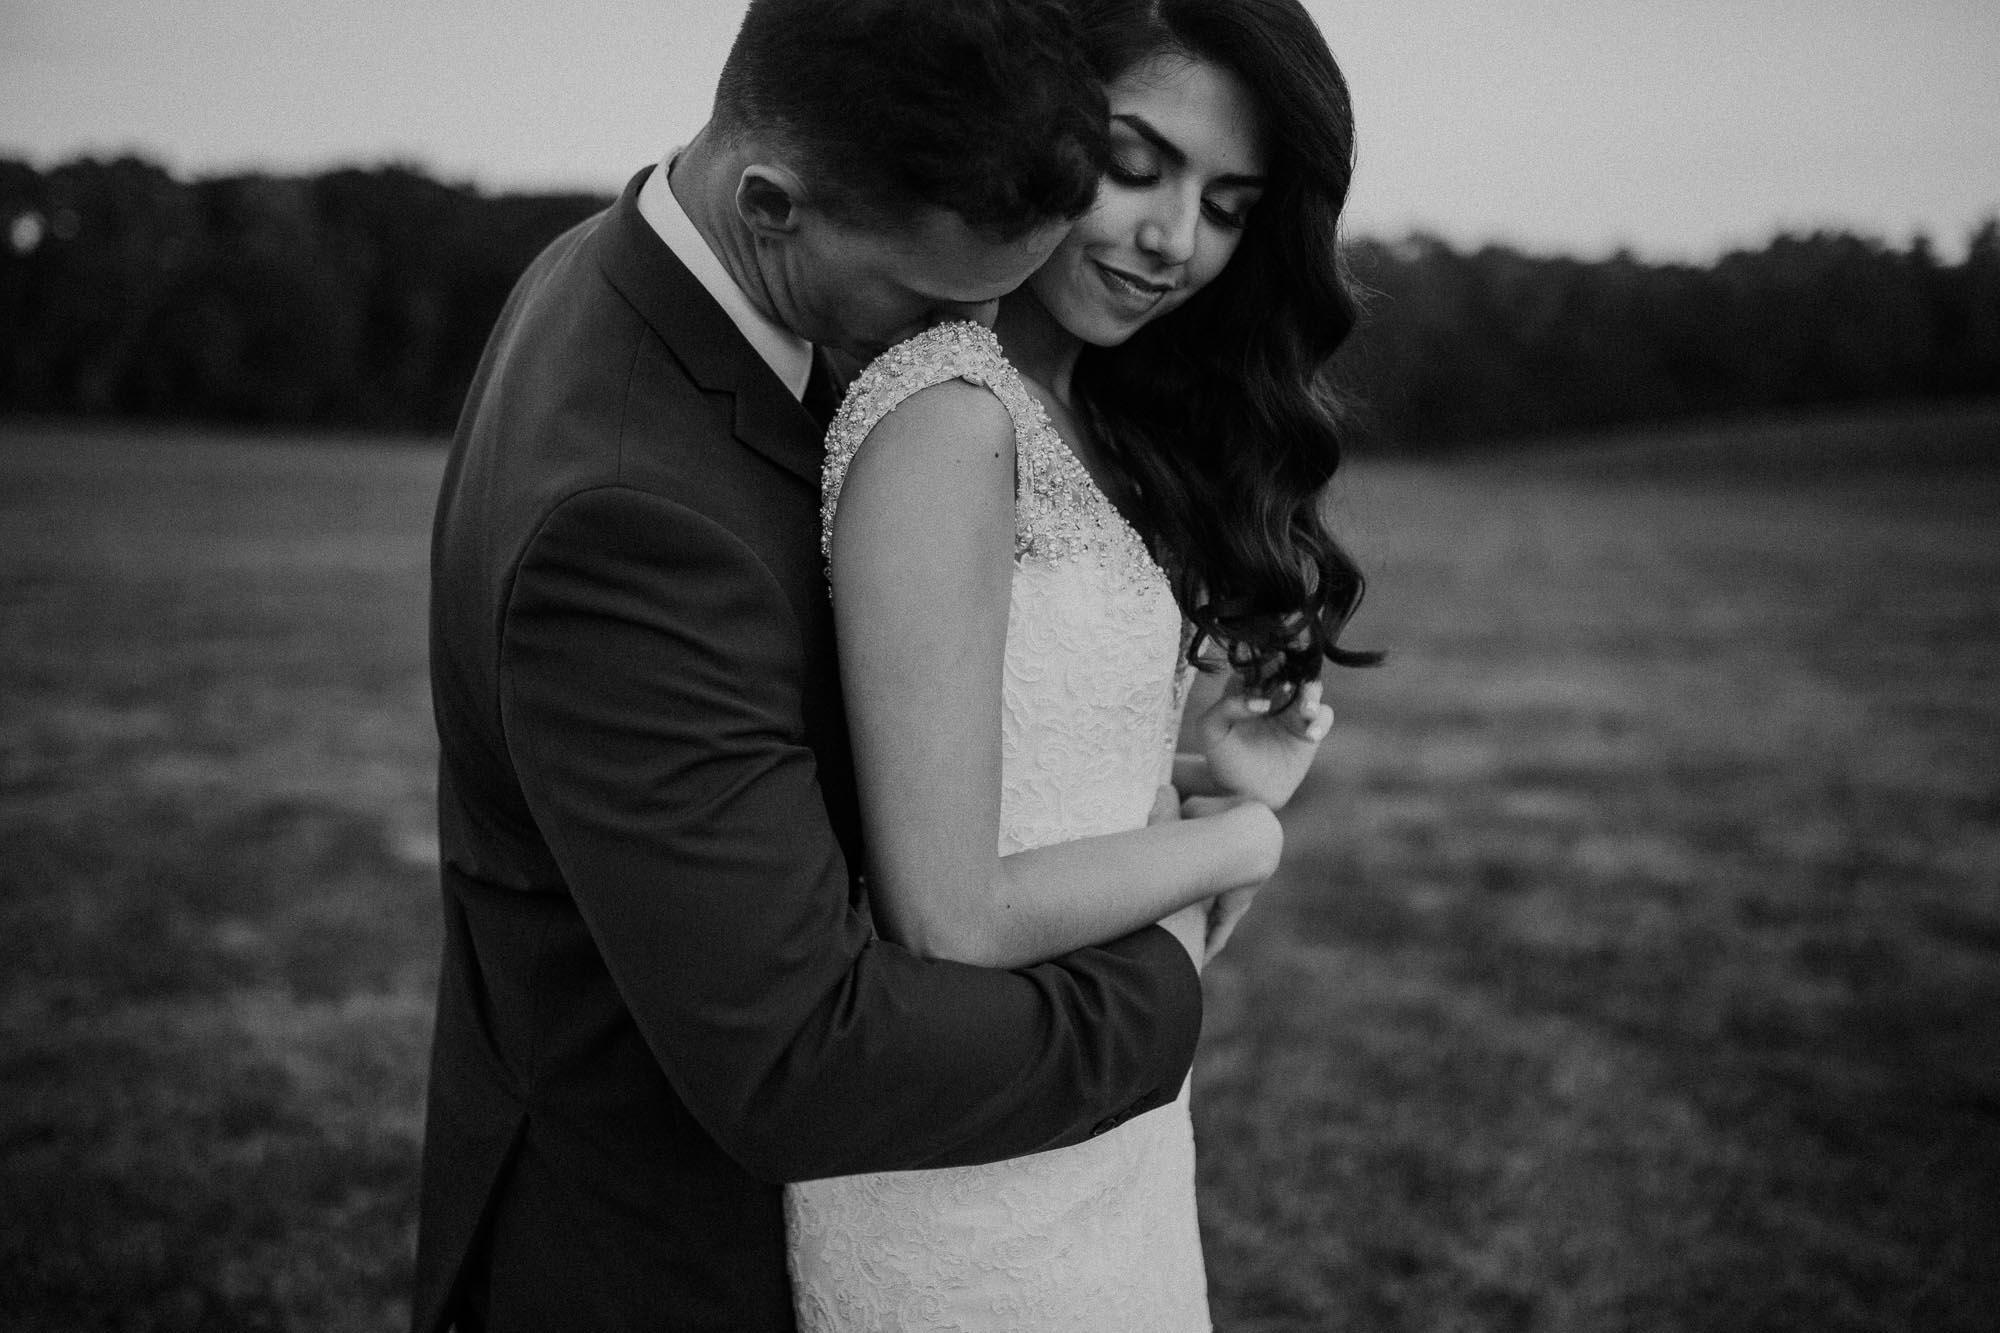 champaign_il_wedding_photography-0882.jpg